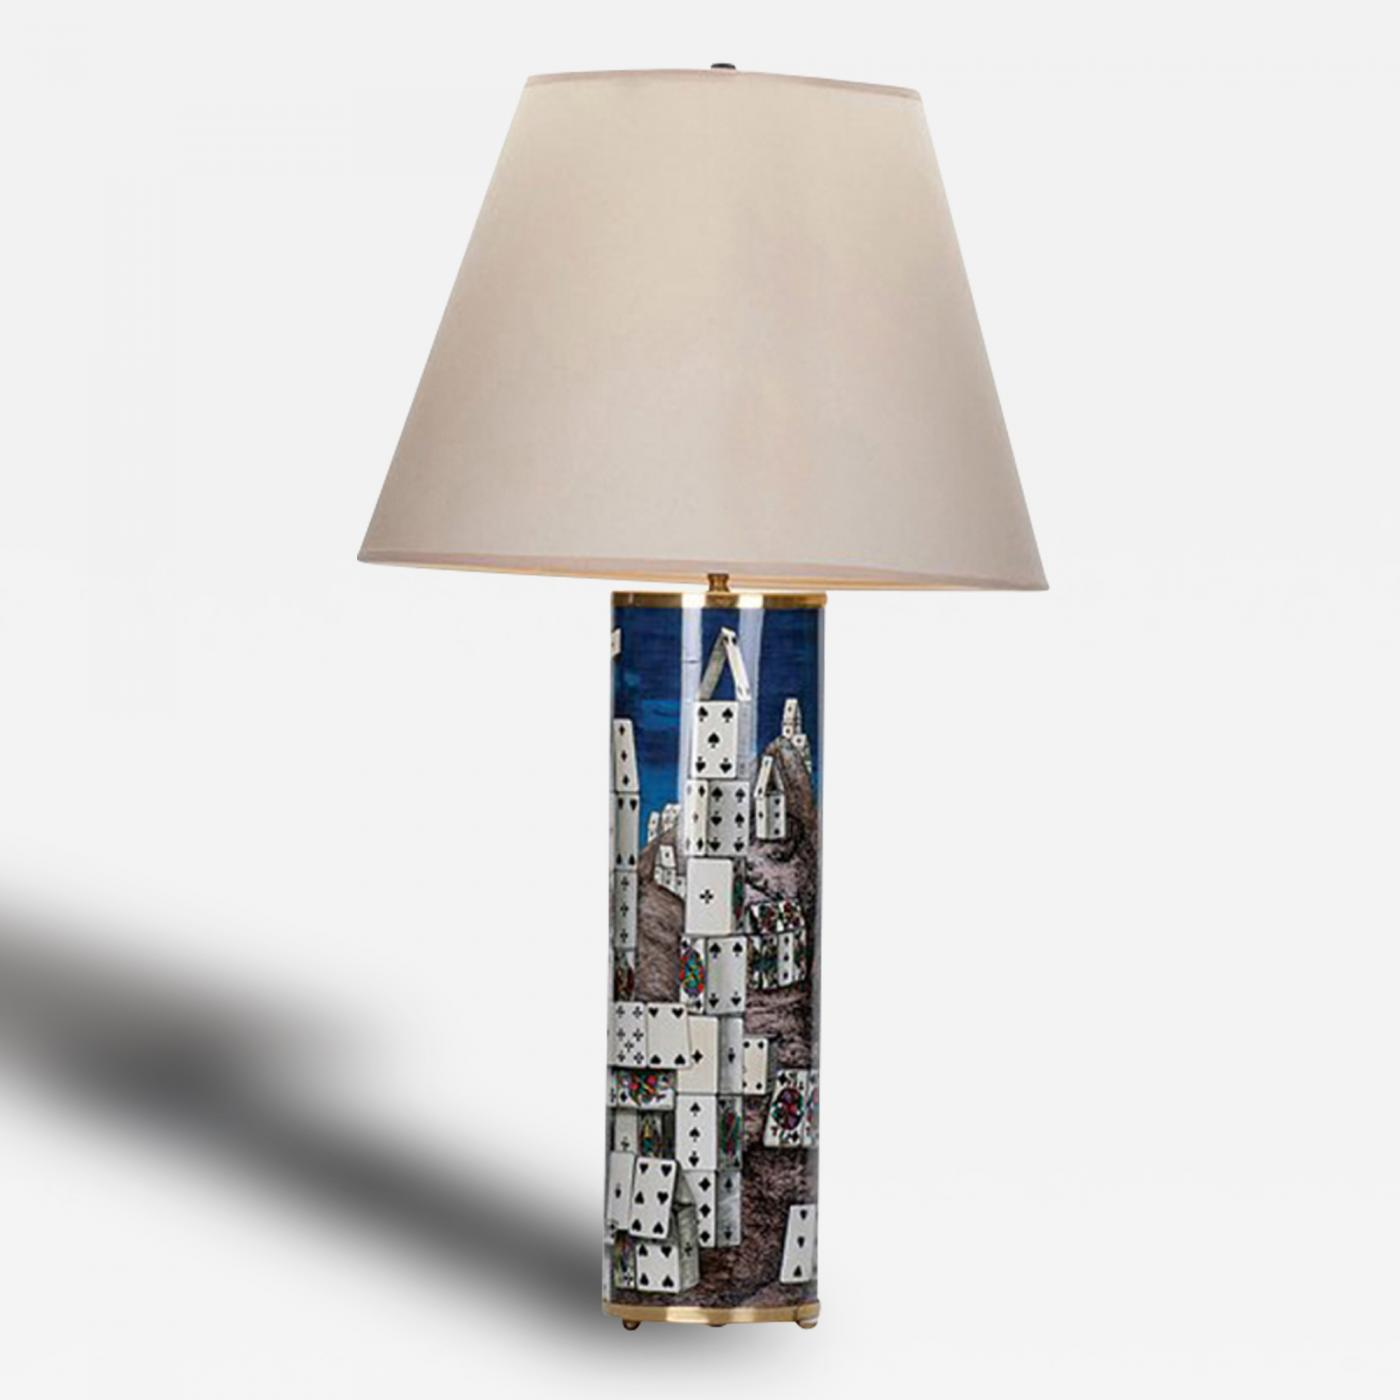 Listings / Furniture / Lighting / Table Lamps